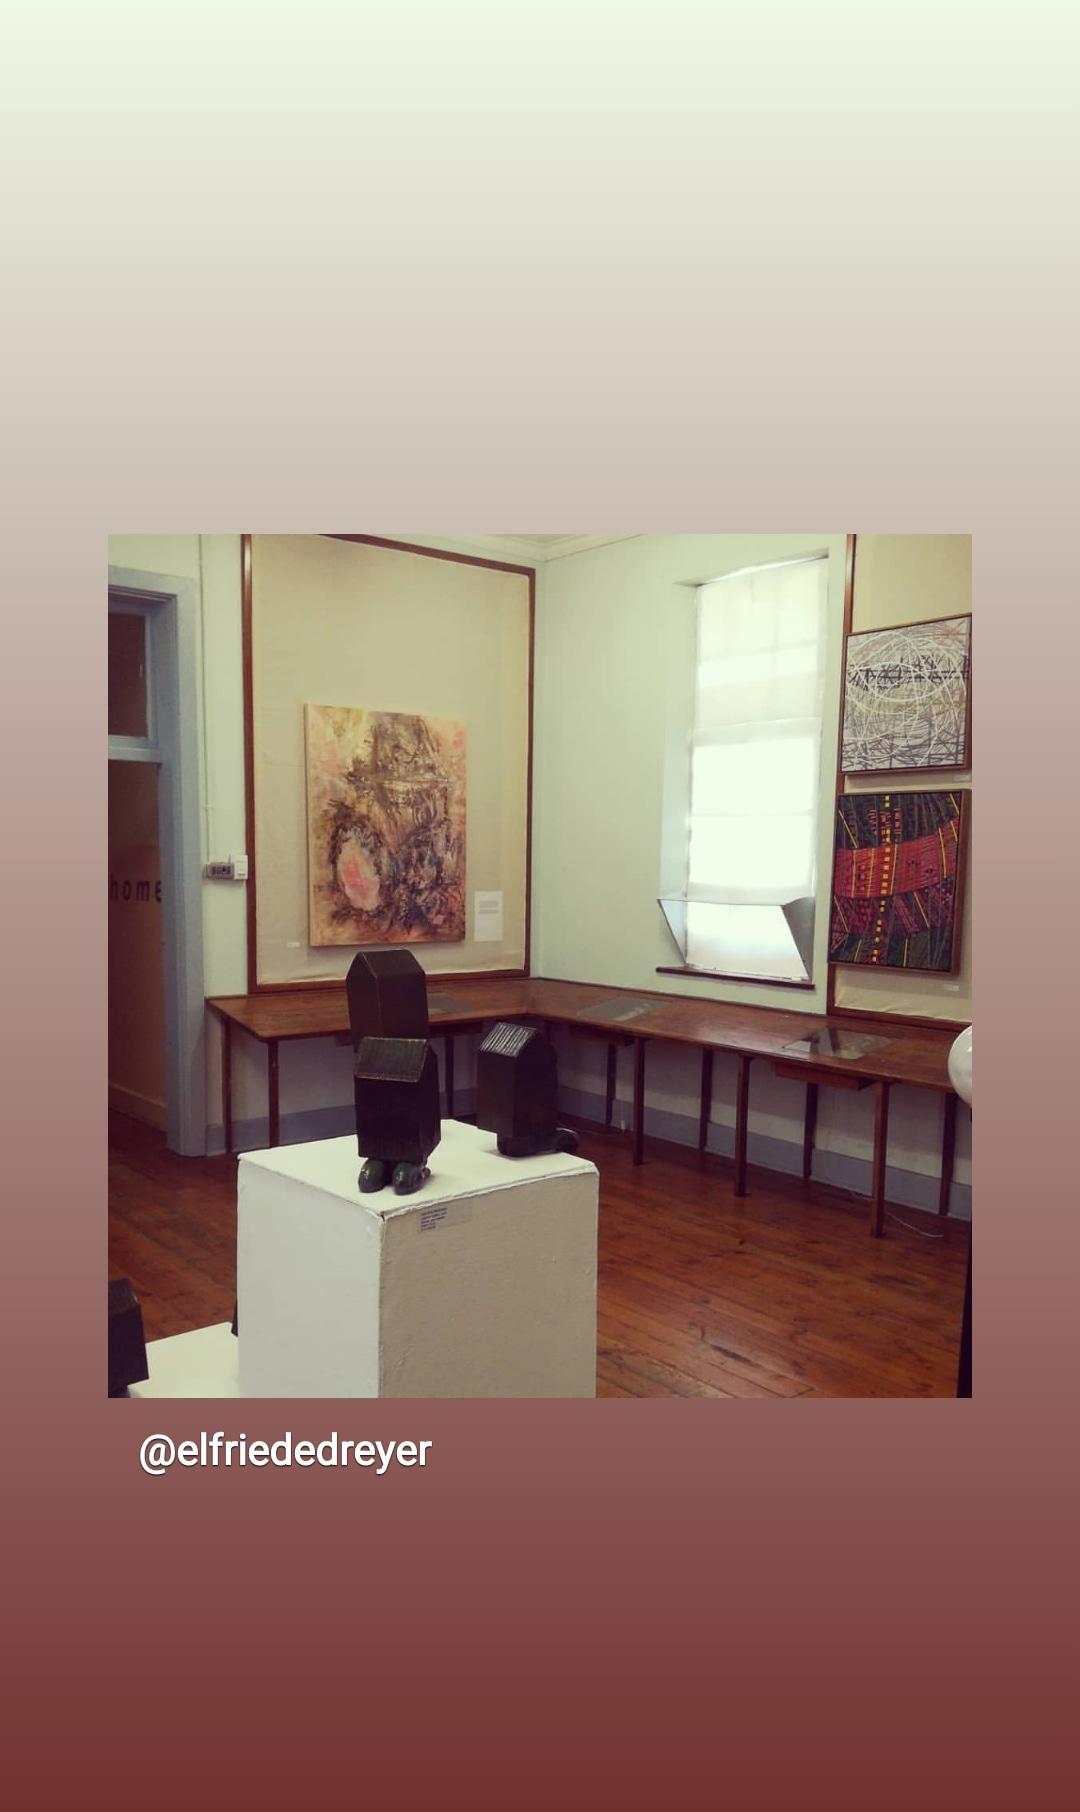 Installation view, Elfriede Dreyer, Loeritha Saayman, Elsa van der Klashorst